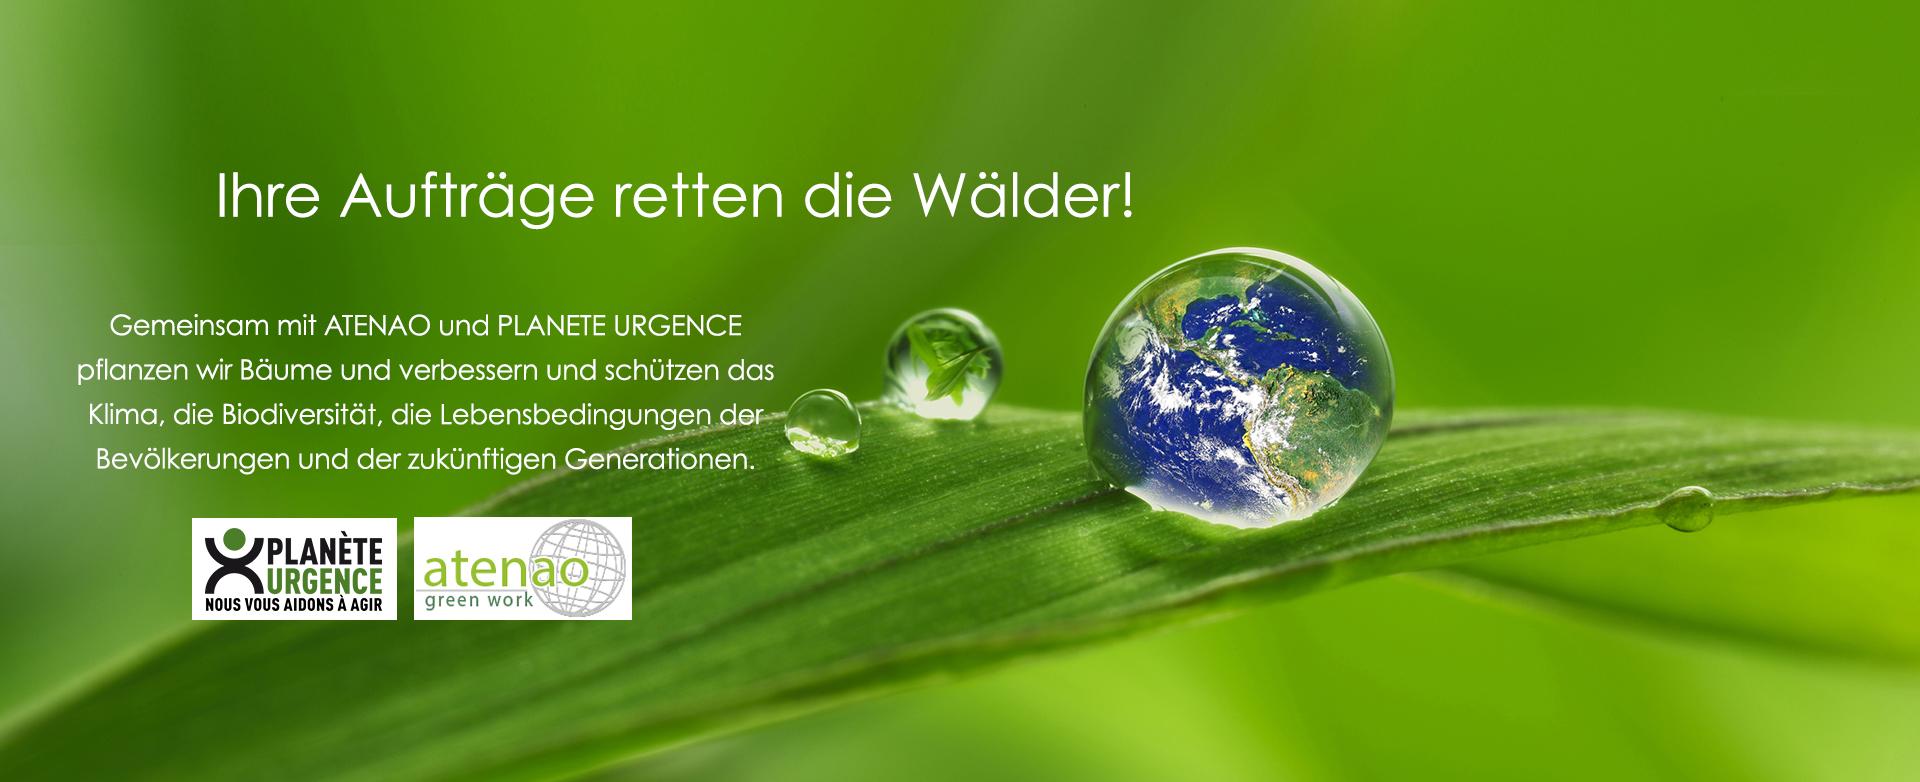 carousel greenwork-DE